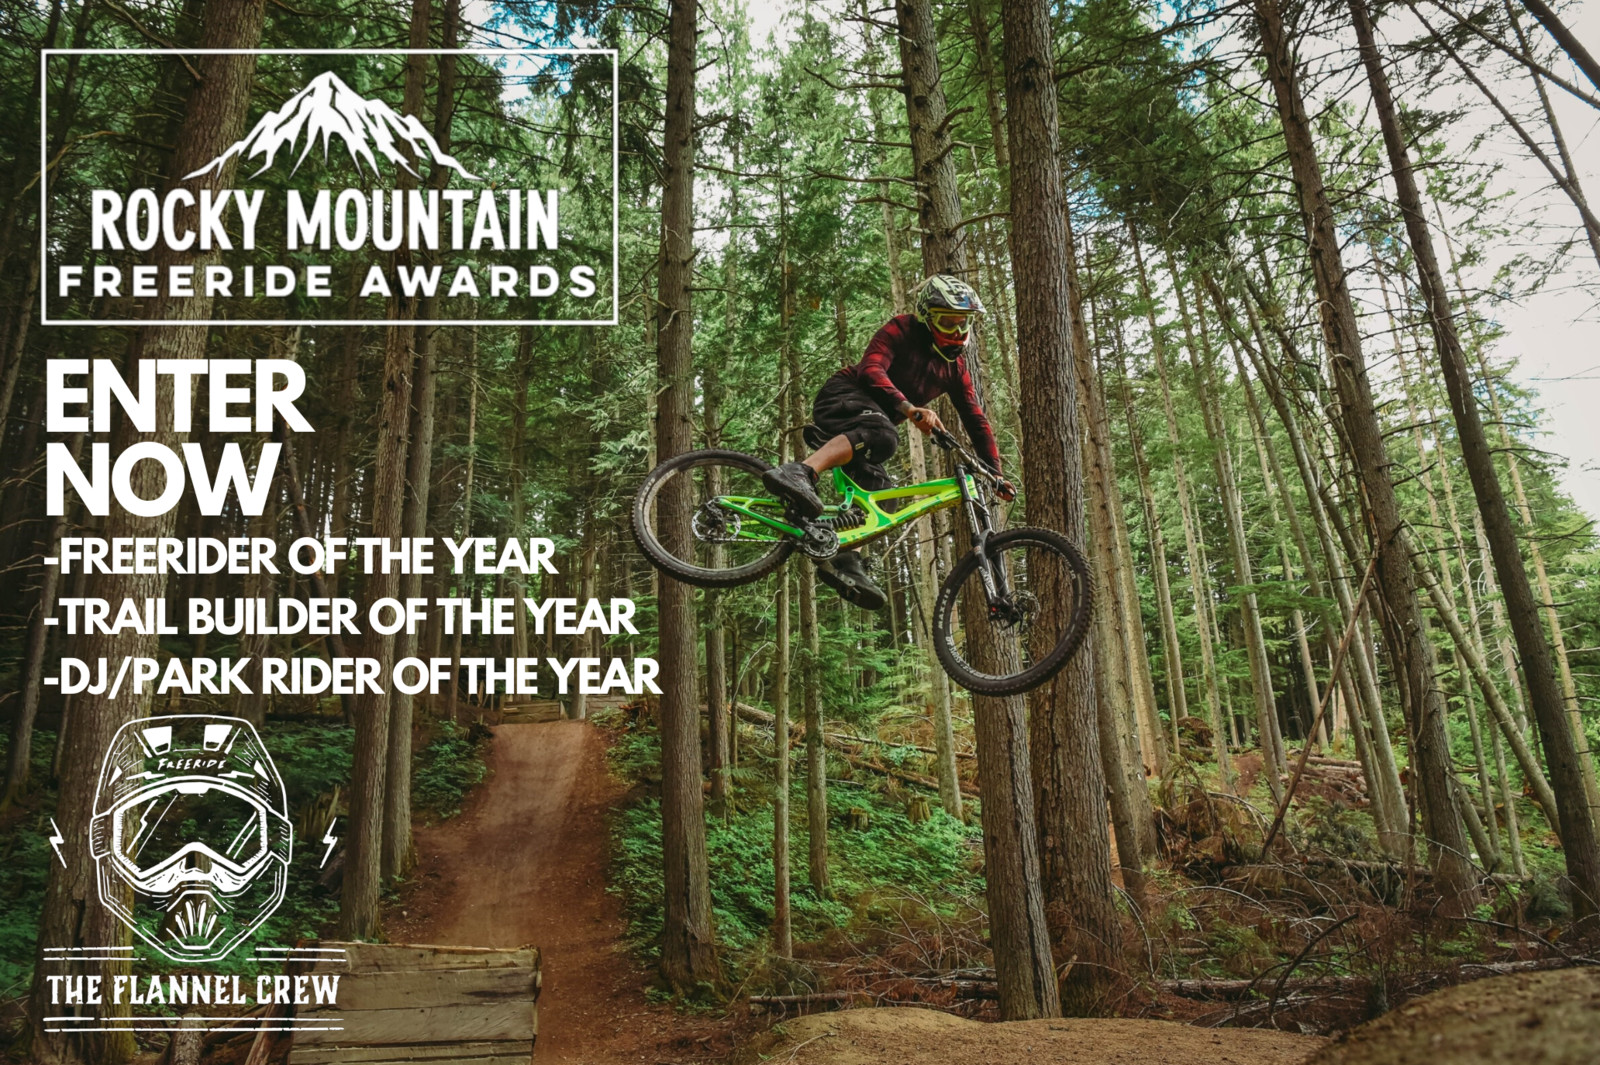 The 2020 Rocky Mountain Freeride Awards